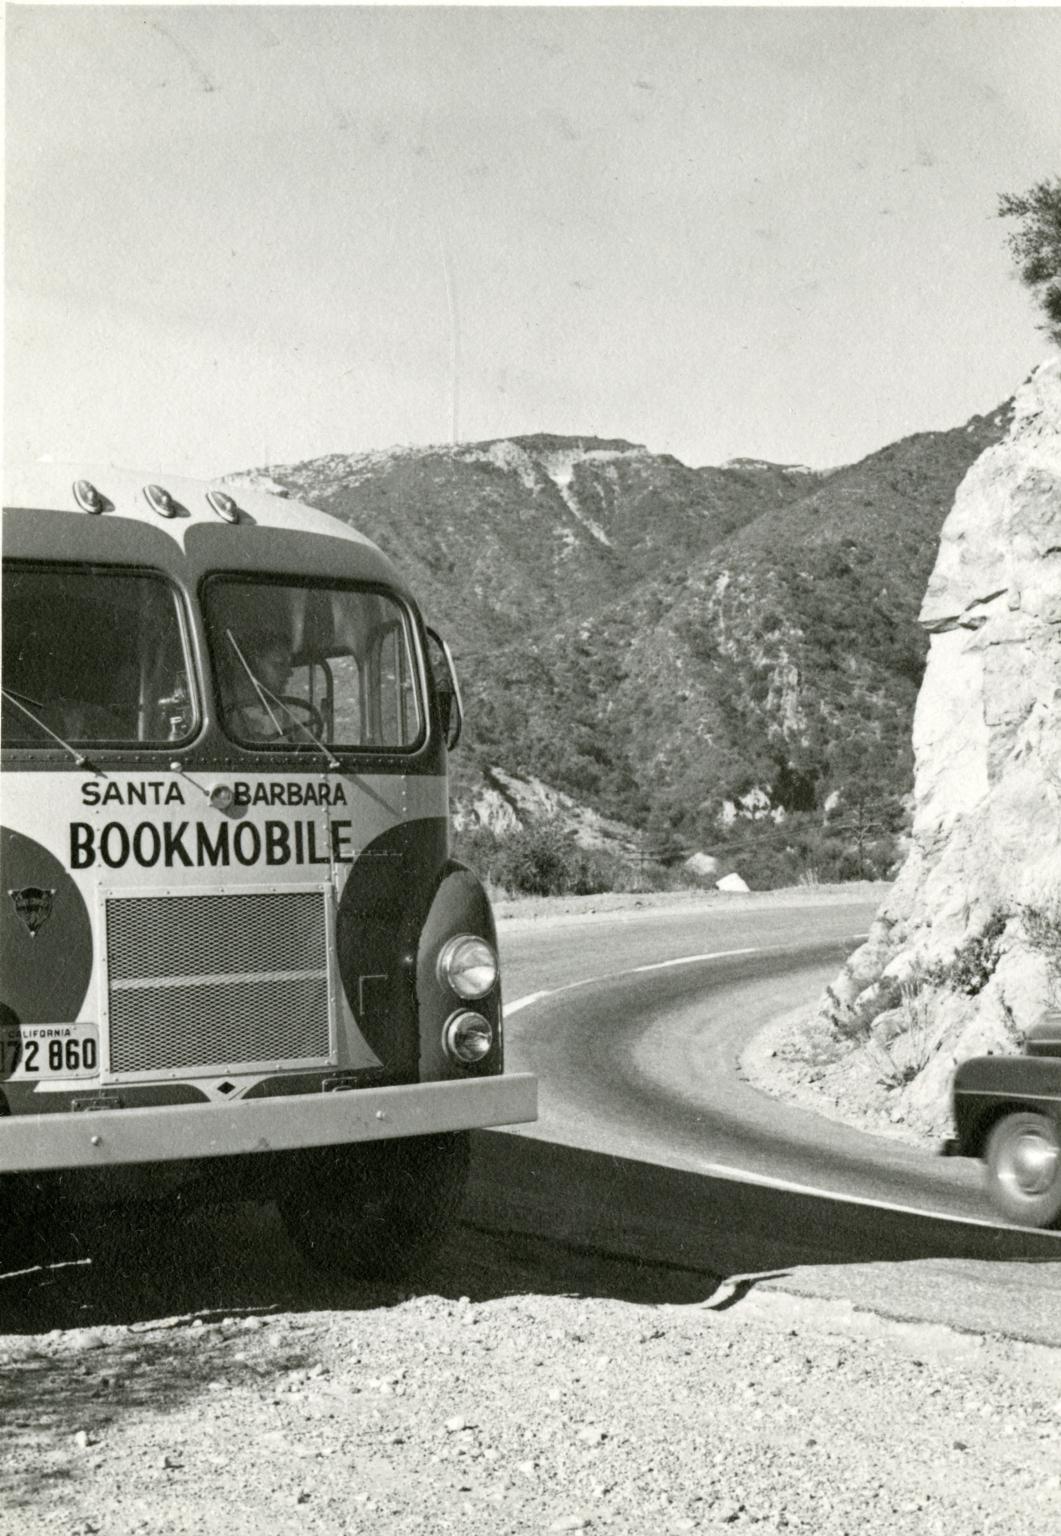 Santa Barbara Public Library - Bookmobile